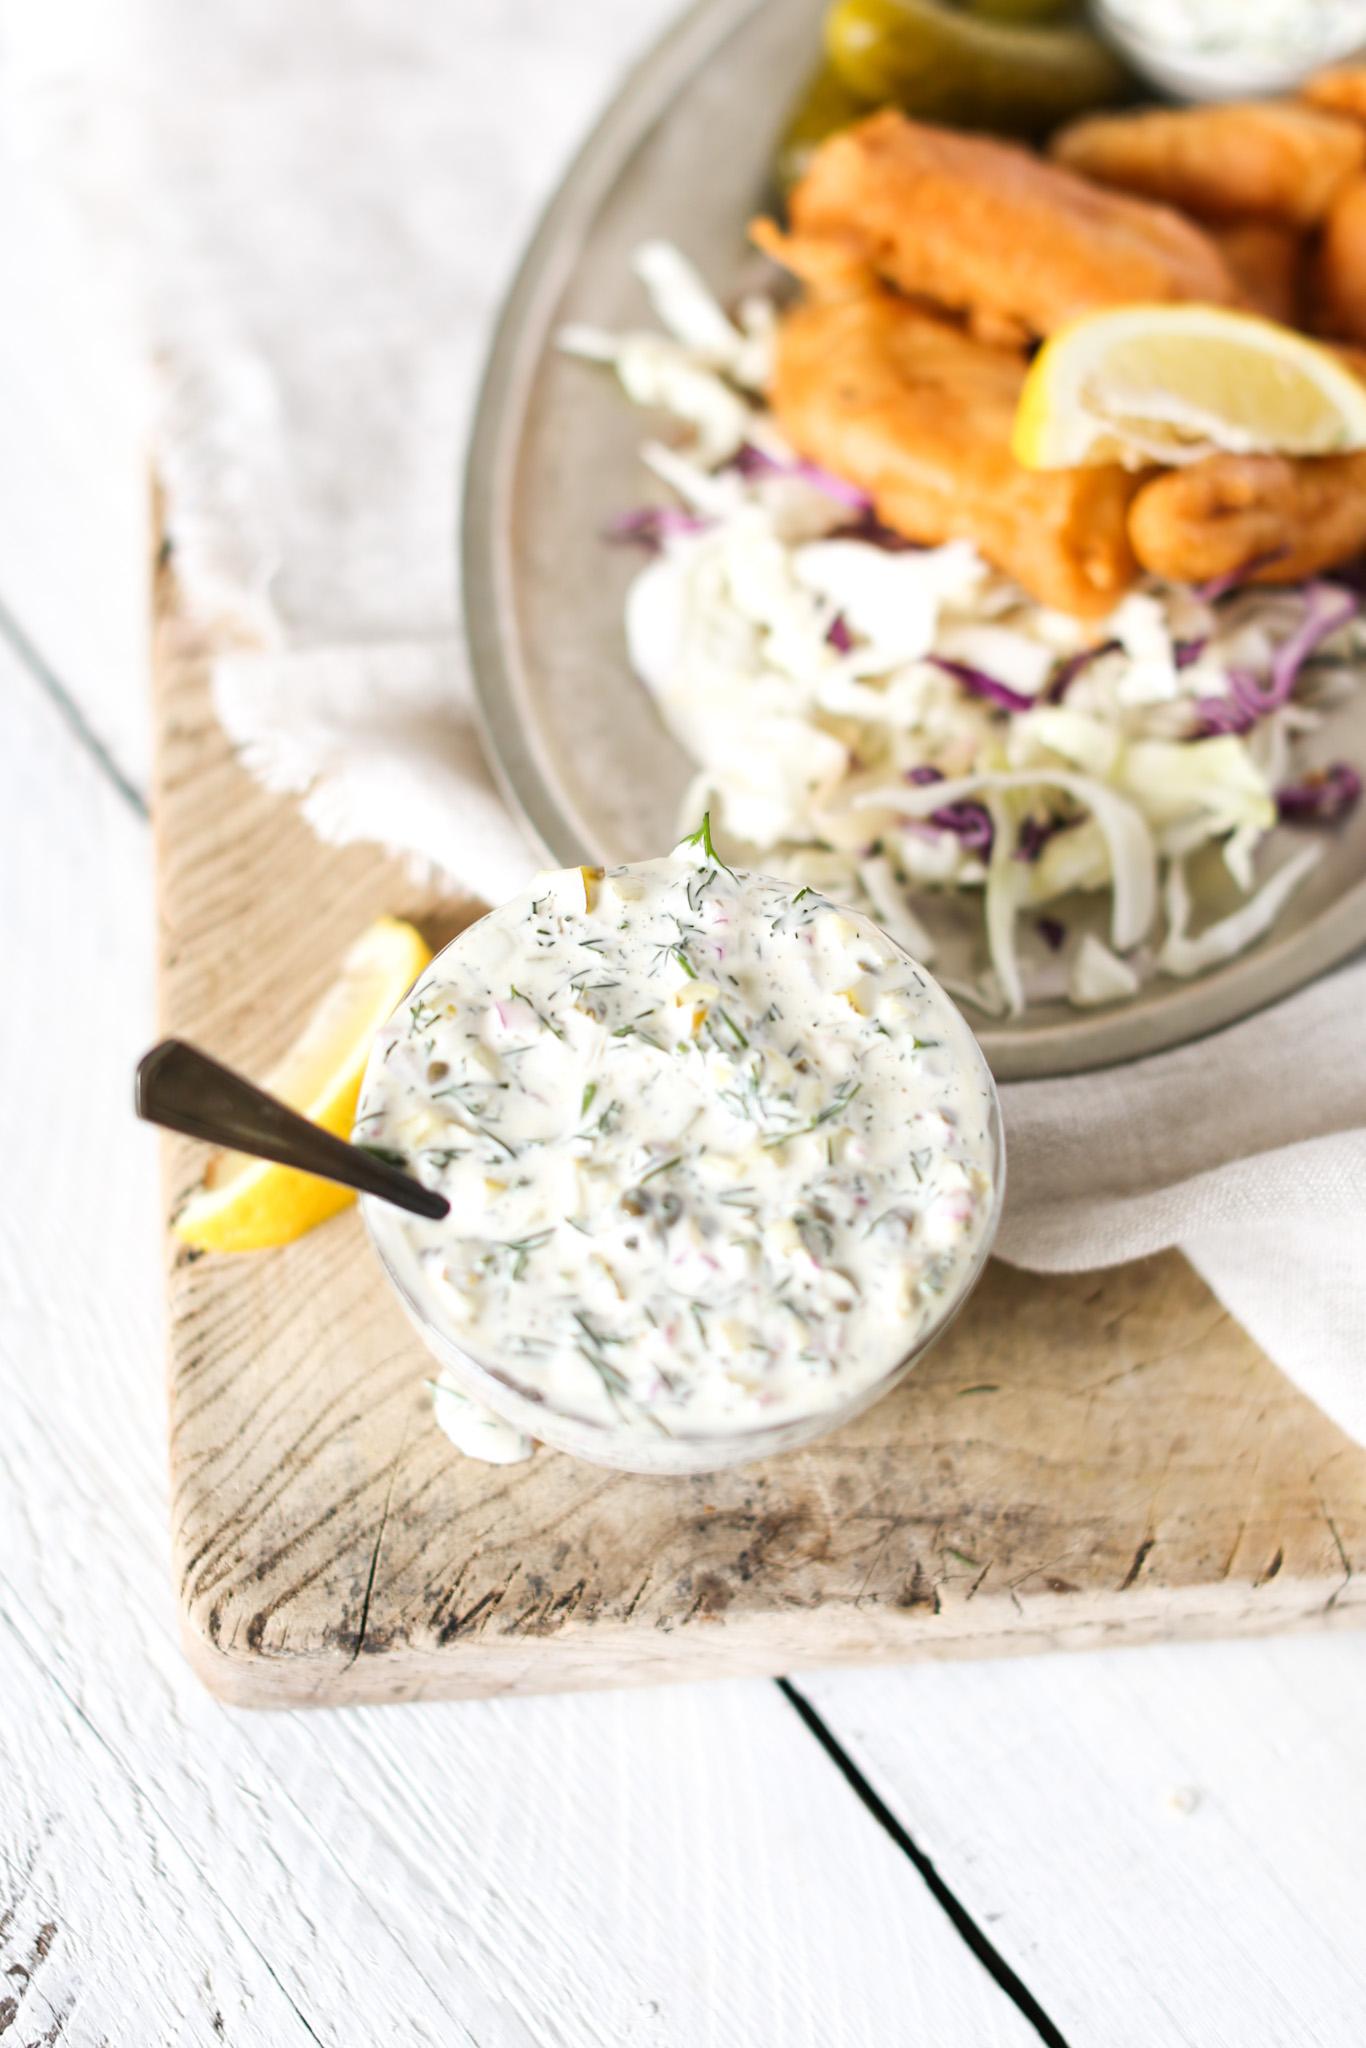 Homemade Dill Tartar Sauce serve with lemon and fried fish